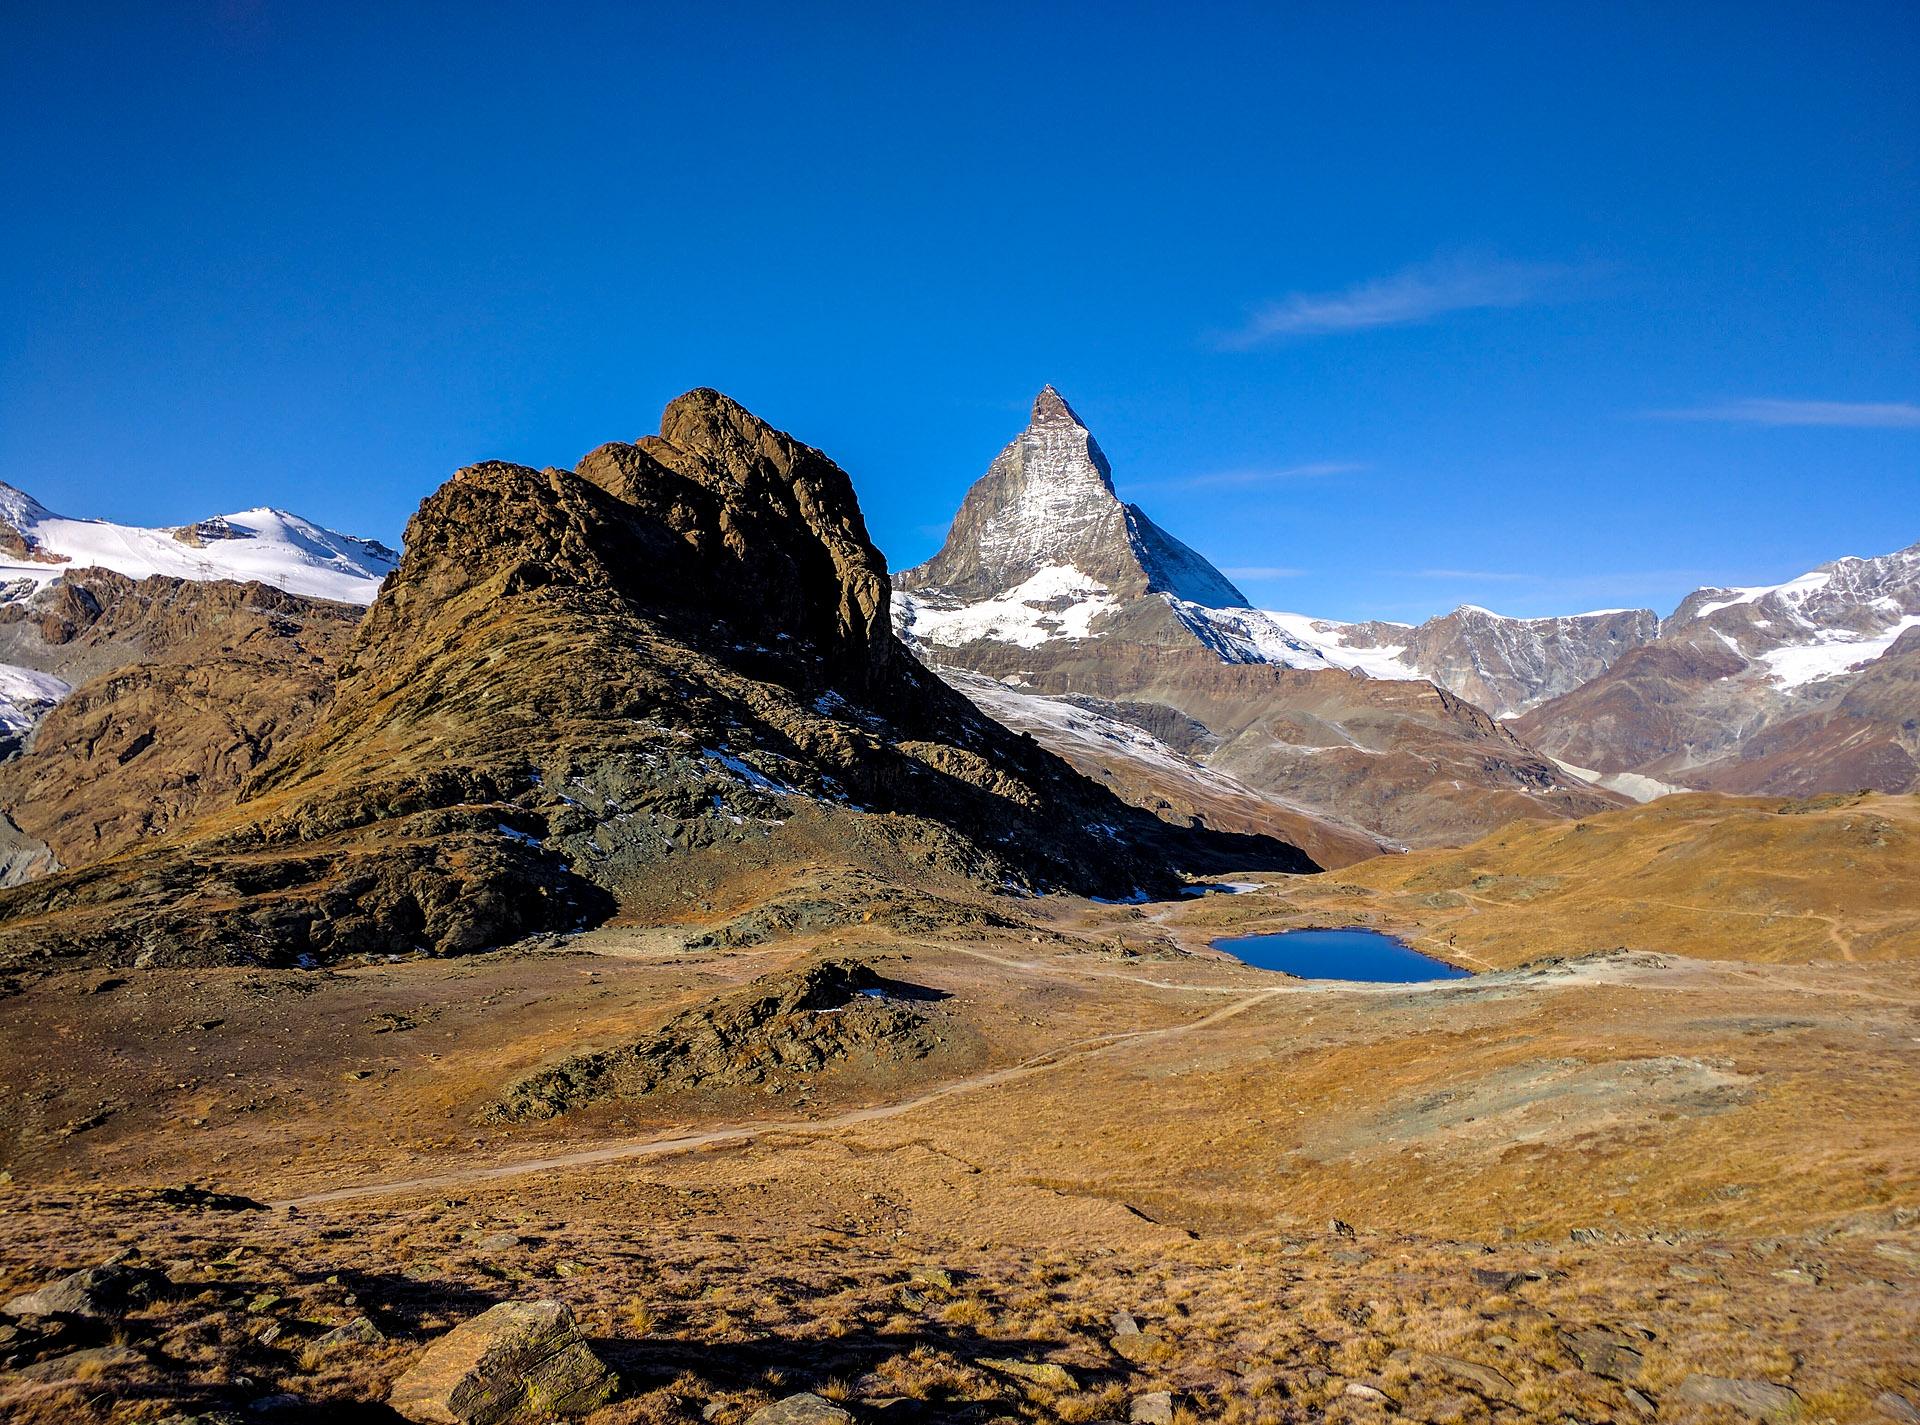 Matterhorn & Riffelsee Lake